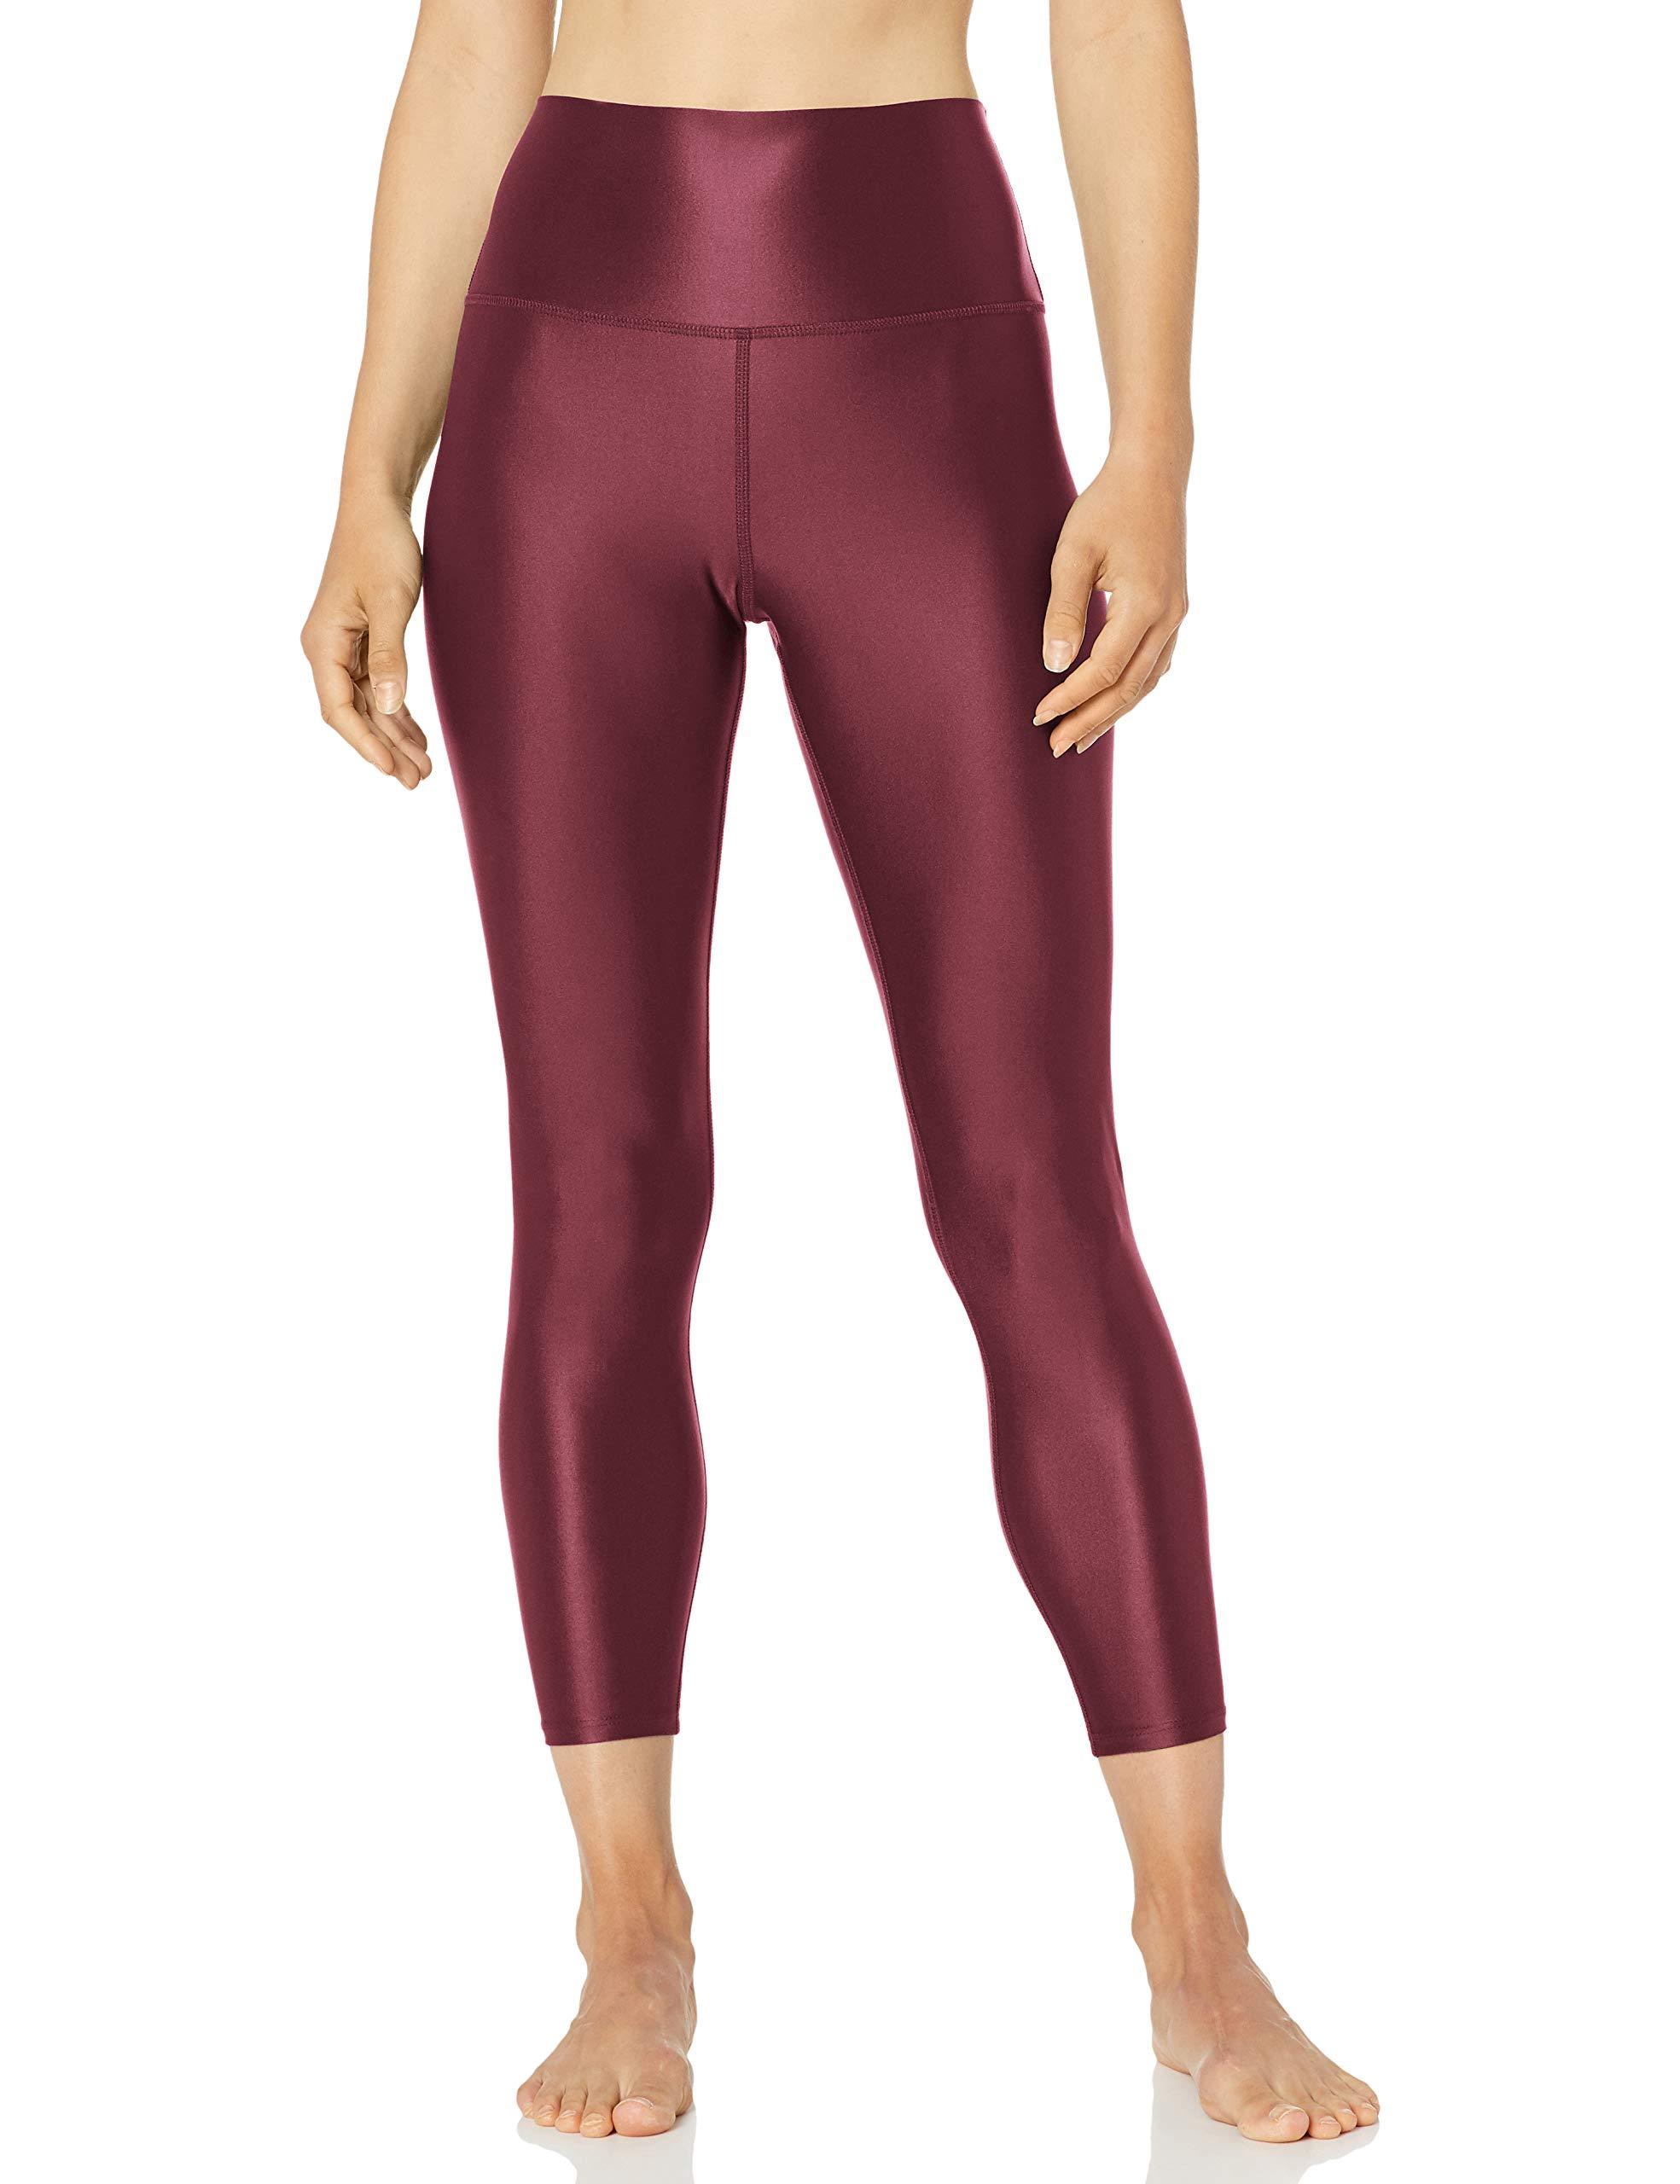 Amazon Brand - Core 10 Women's Icon Series Liquid Shine High Waist Yoga 7/8 Crop Legging